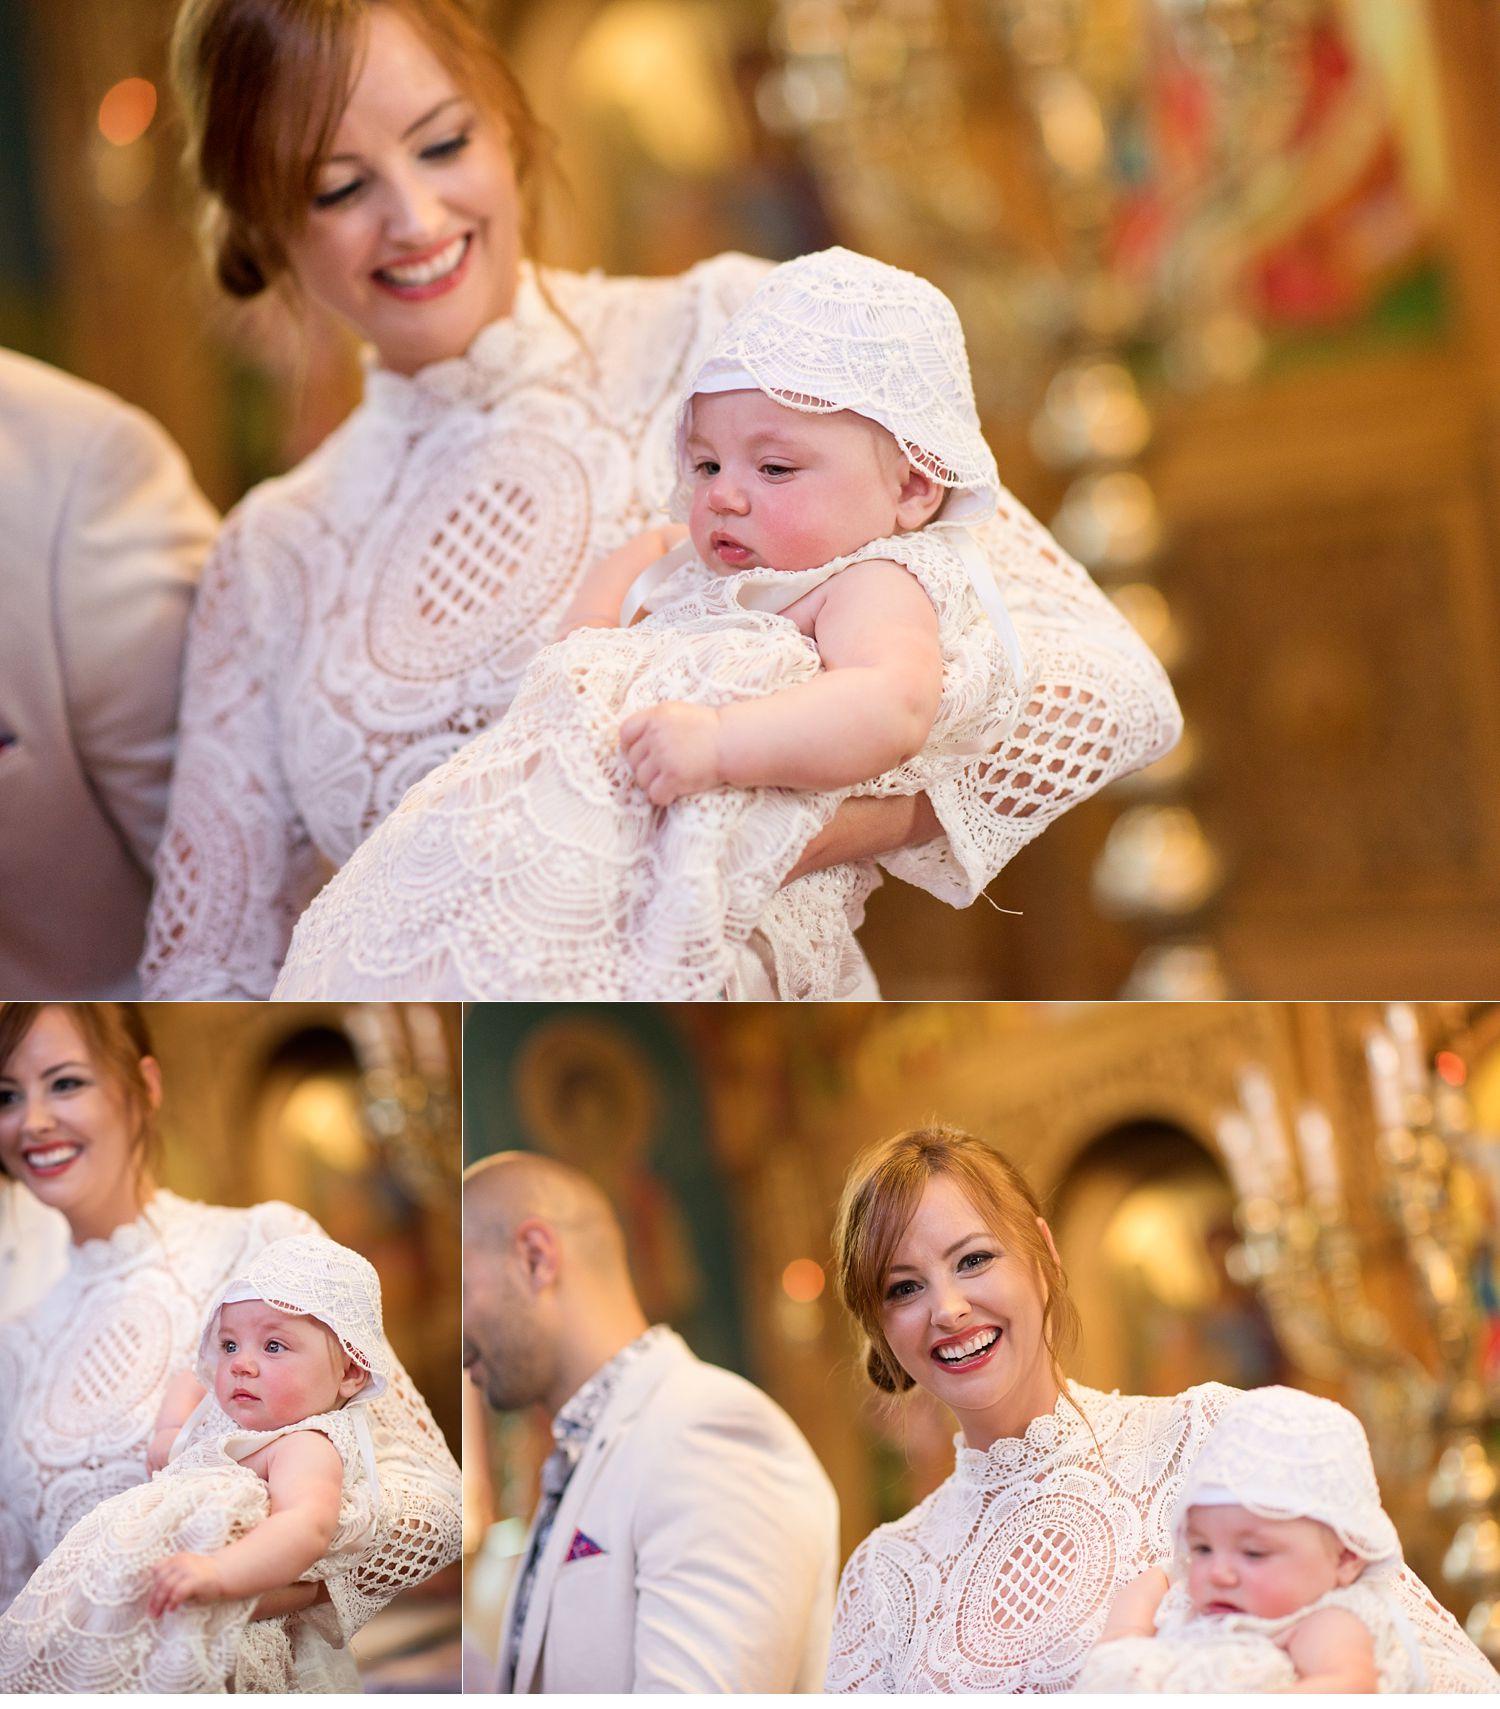 baby-natural-christening-baptism-photographer-melbourne-bec-stewart-lifestyle-photography-24.jpg